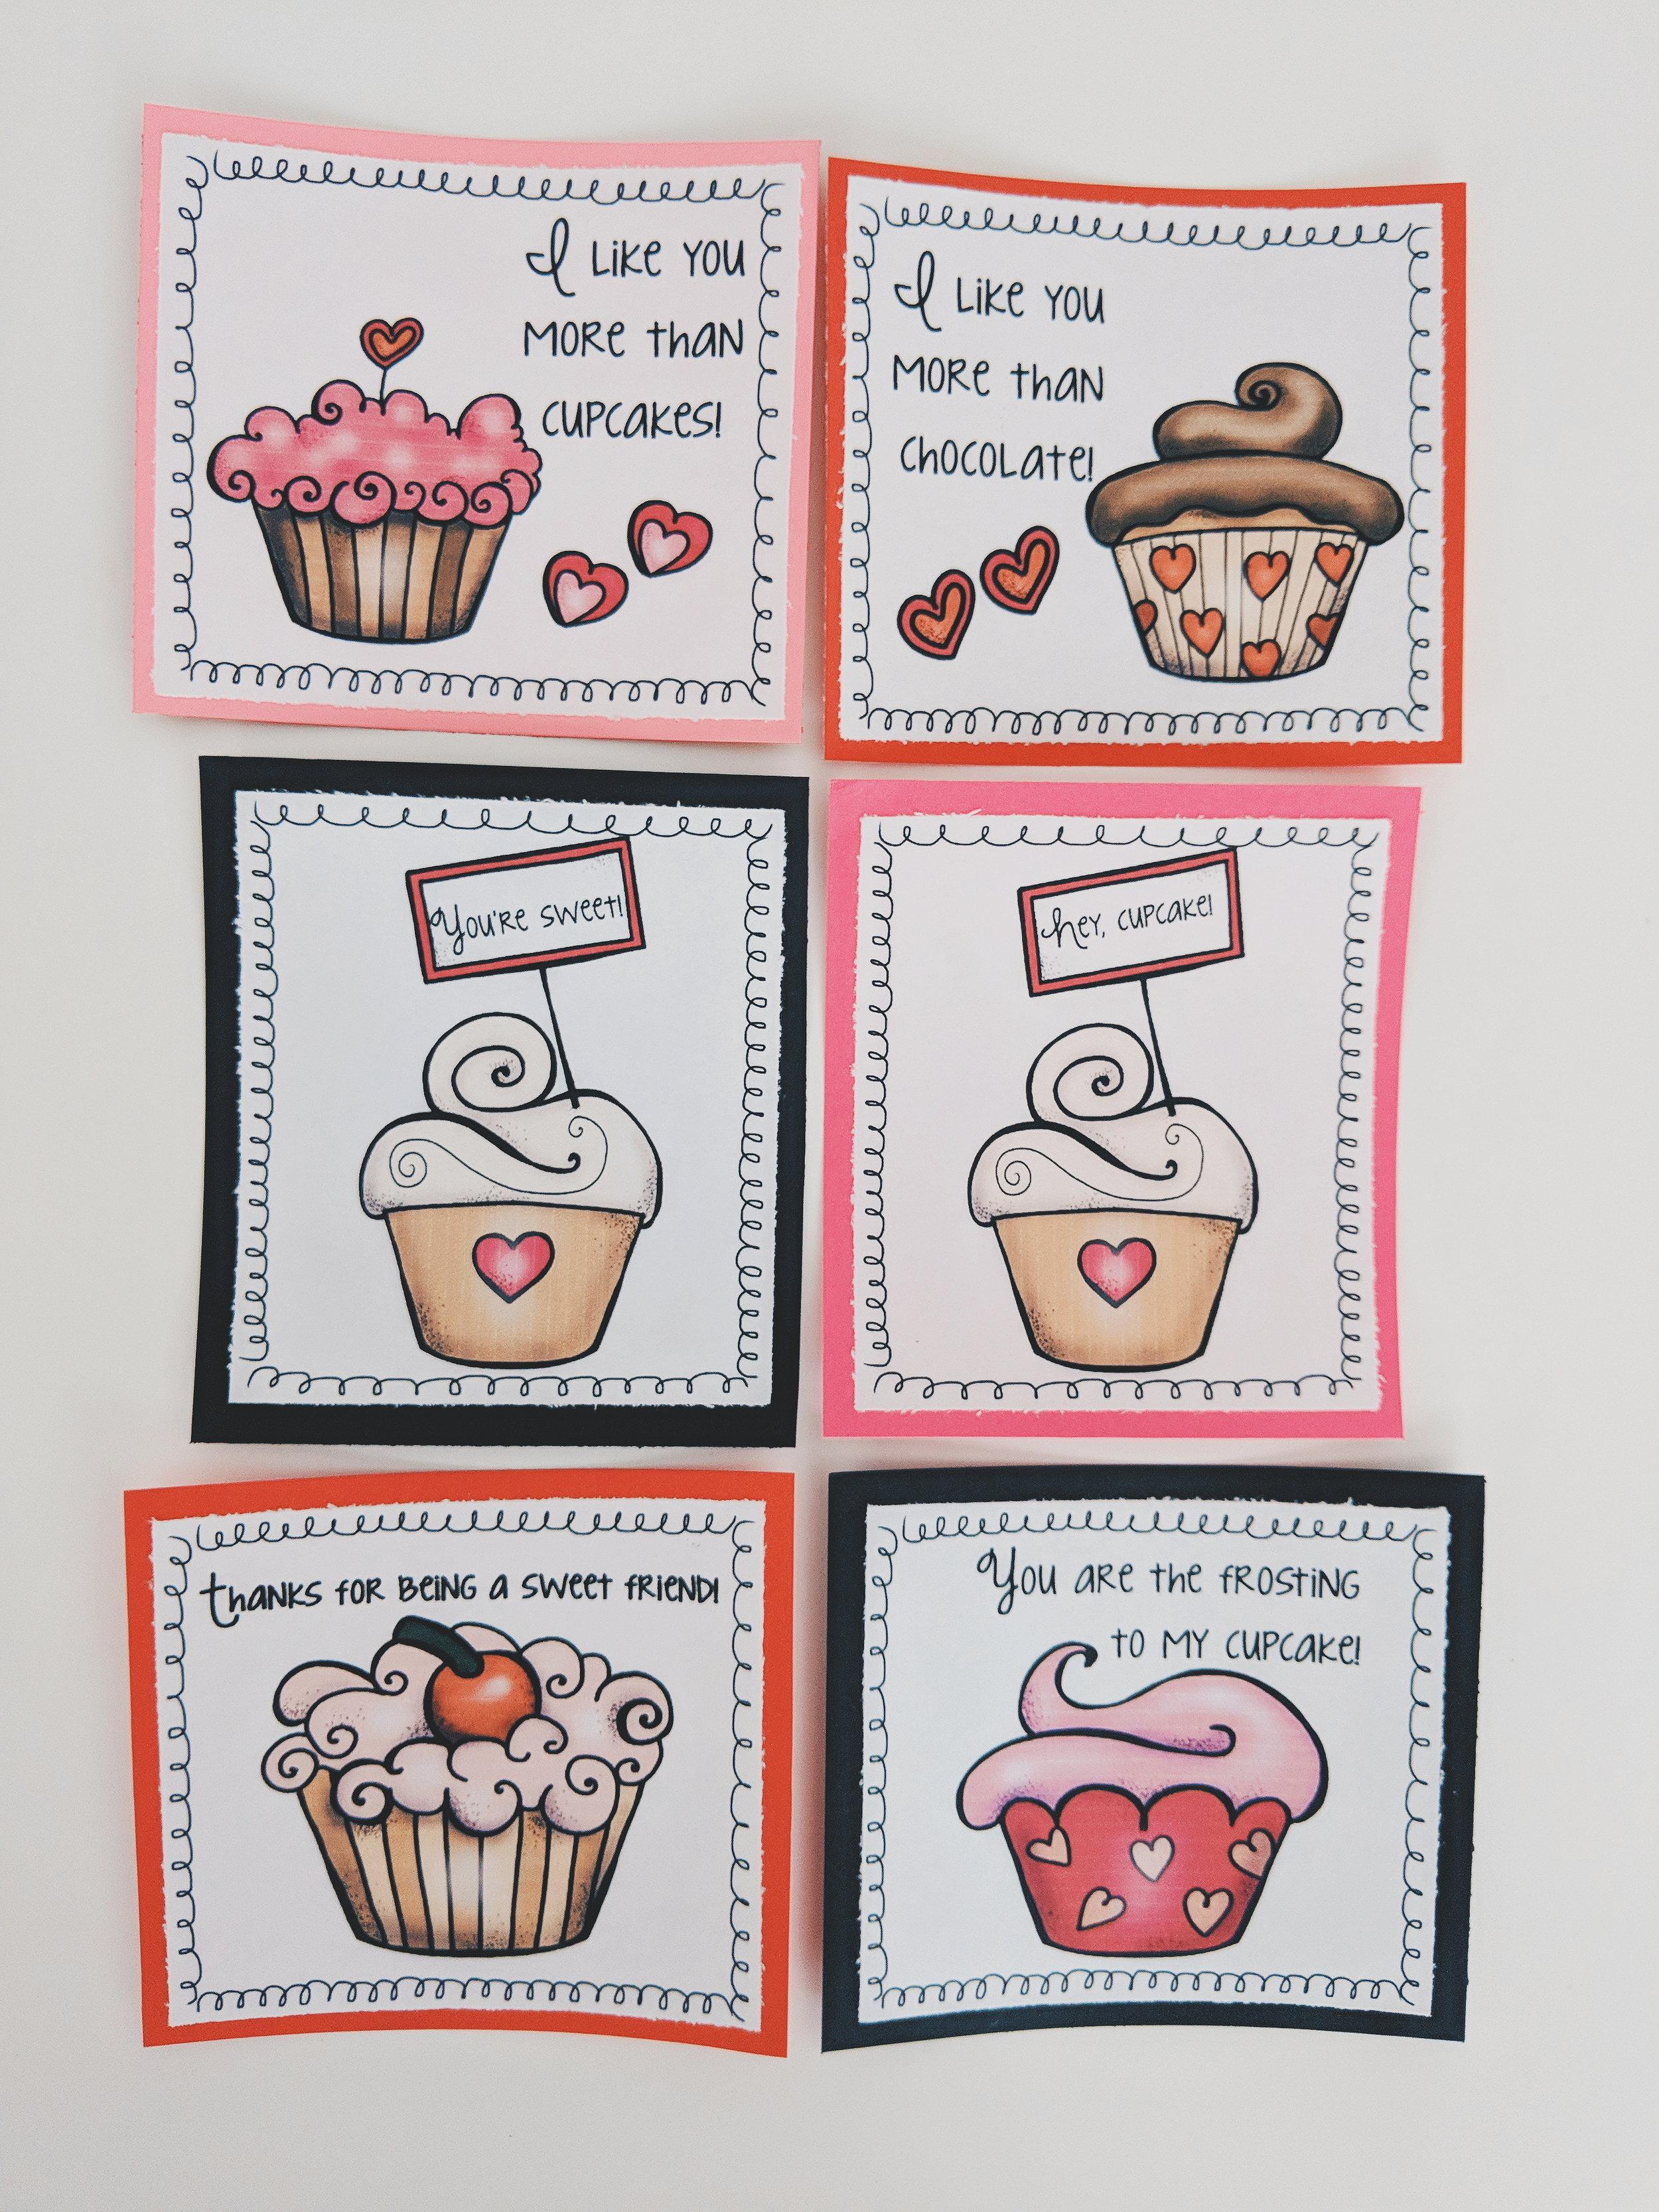 Free Printable Valentines www.momentswithmiss.com 9.jpg